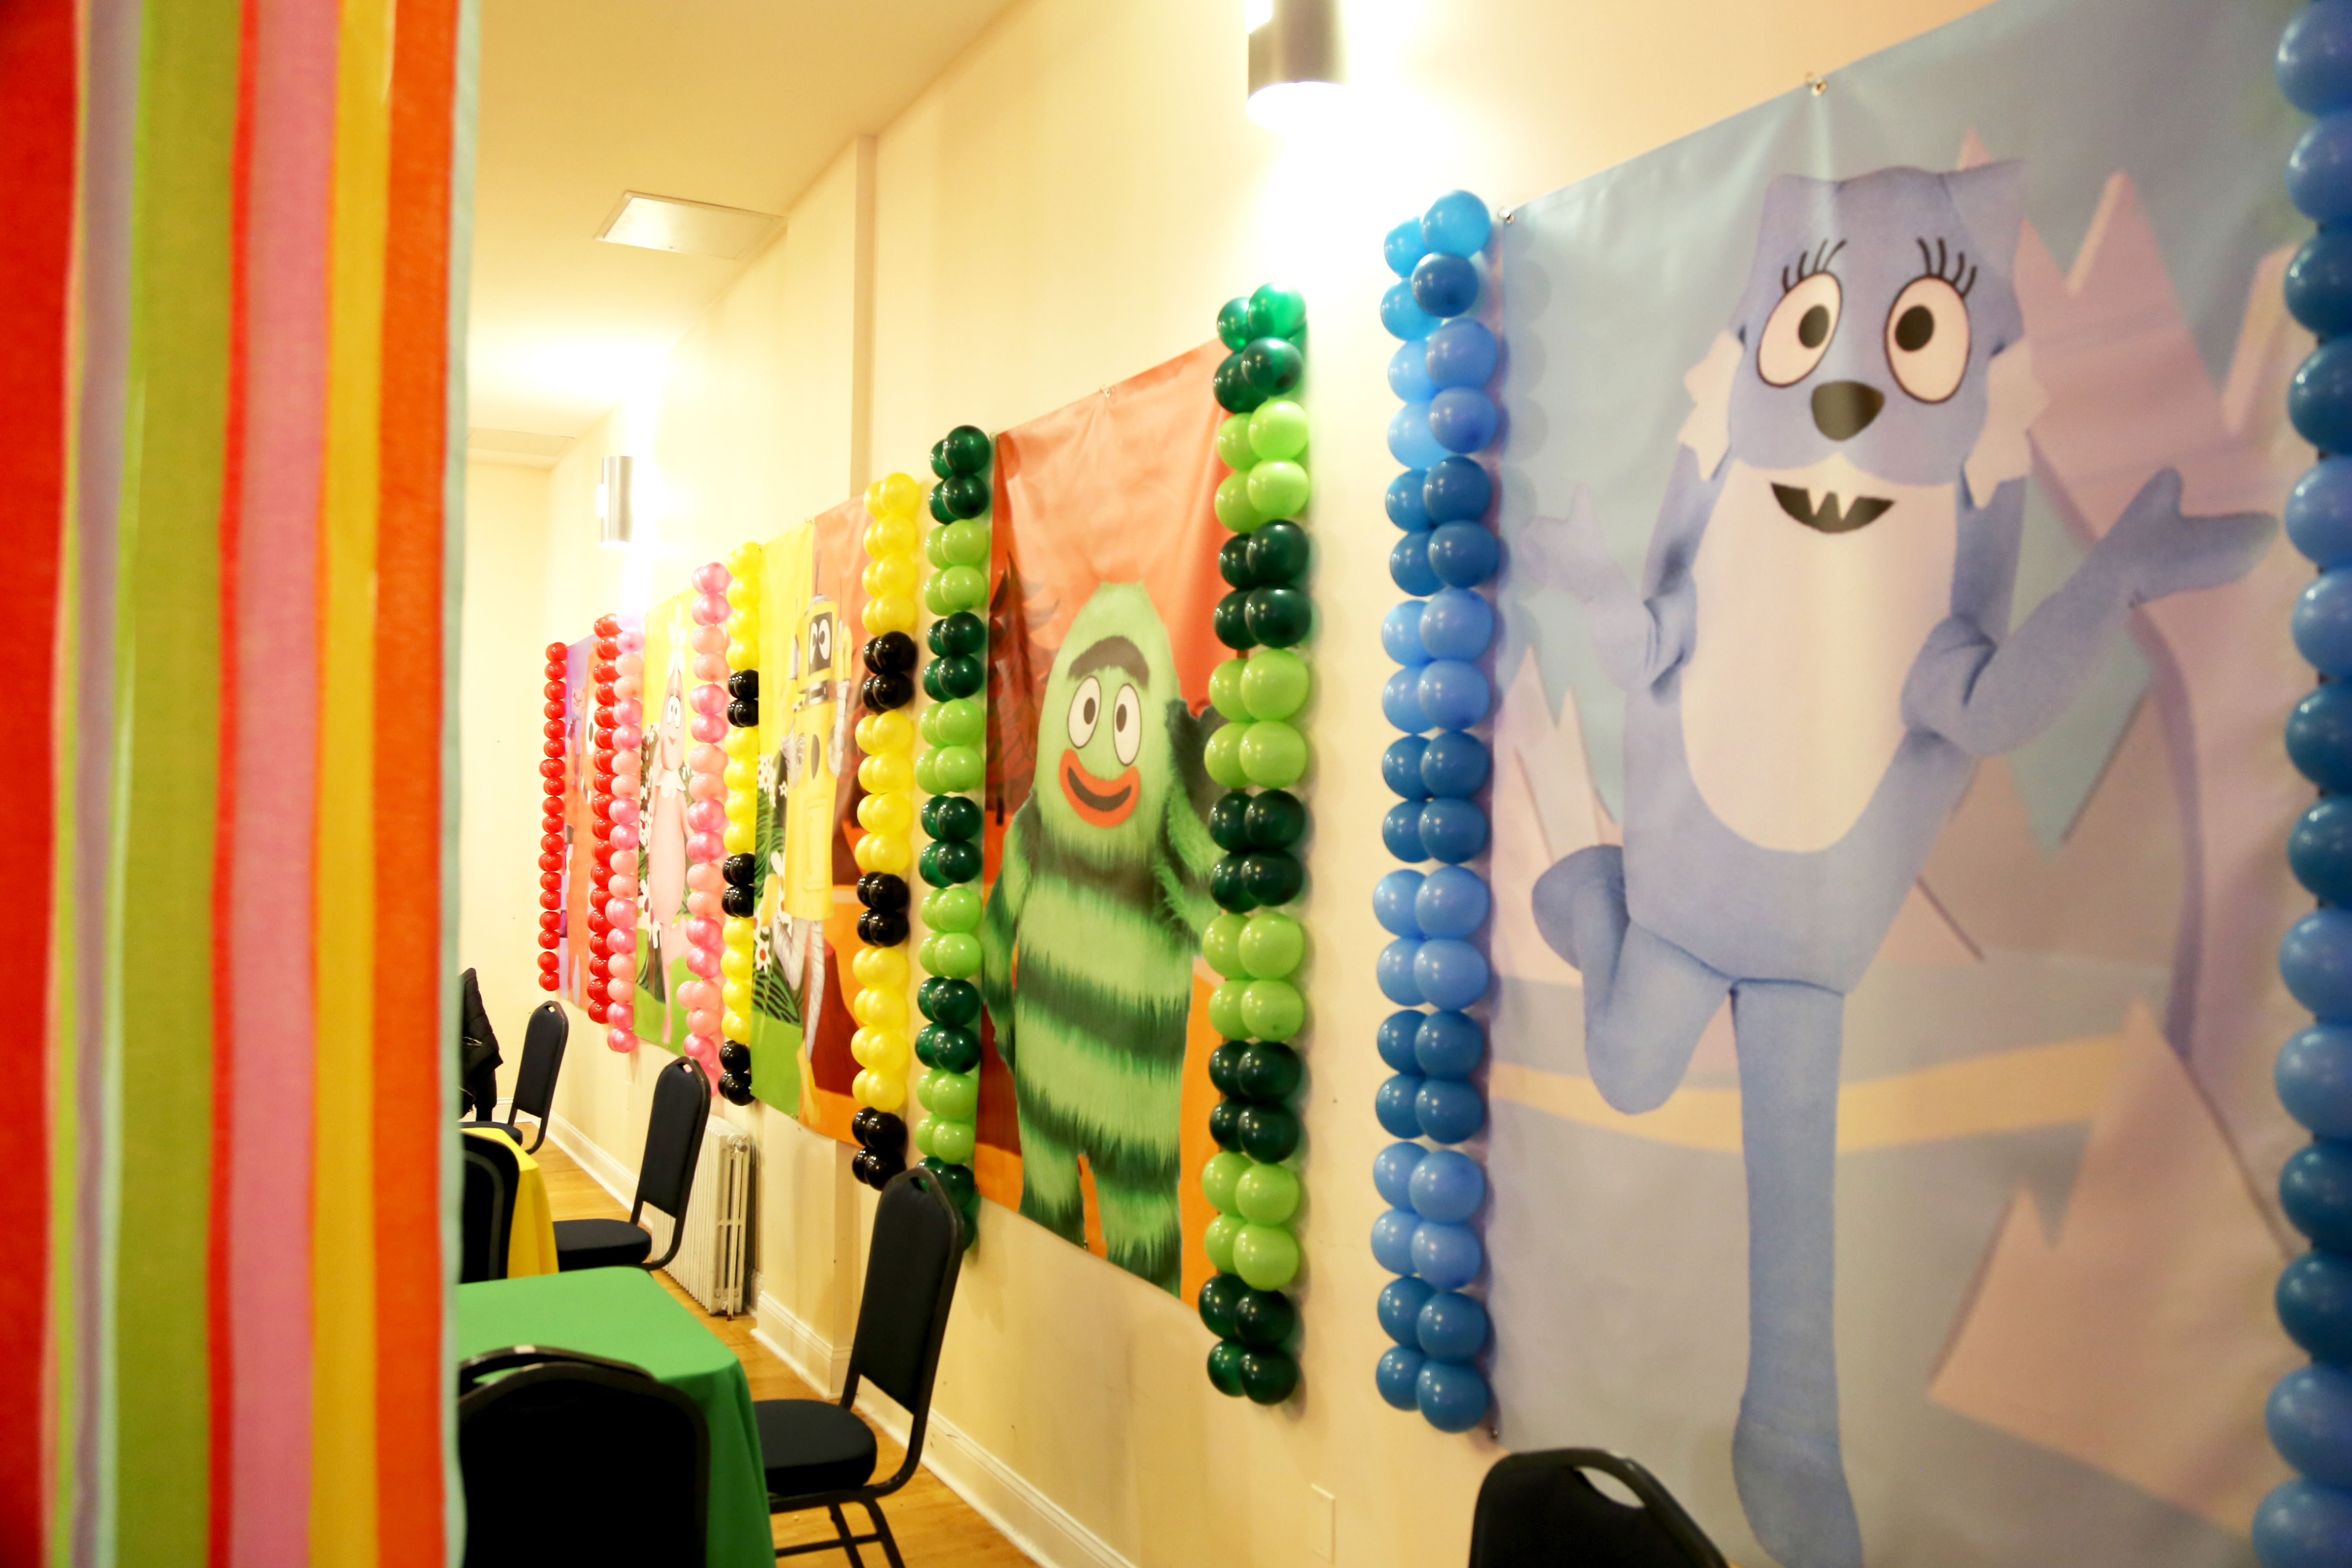 Fancy Party Decorations Wall Scenes Elaboration - Wall Art ...